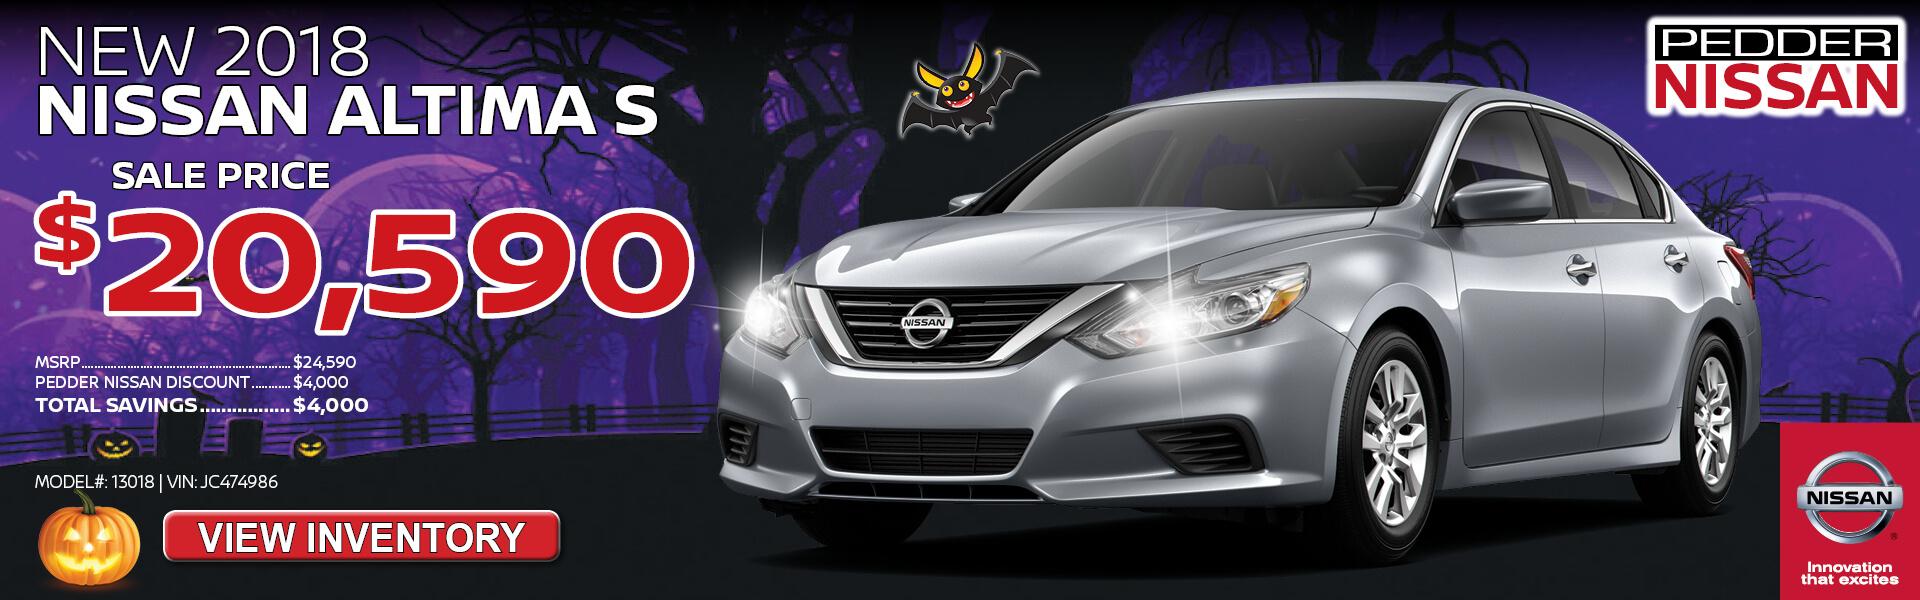 Nissan Altima $20,590 Purchase